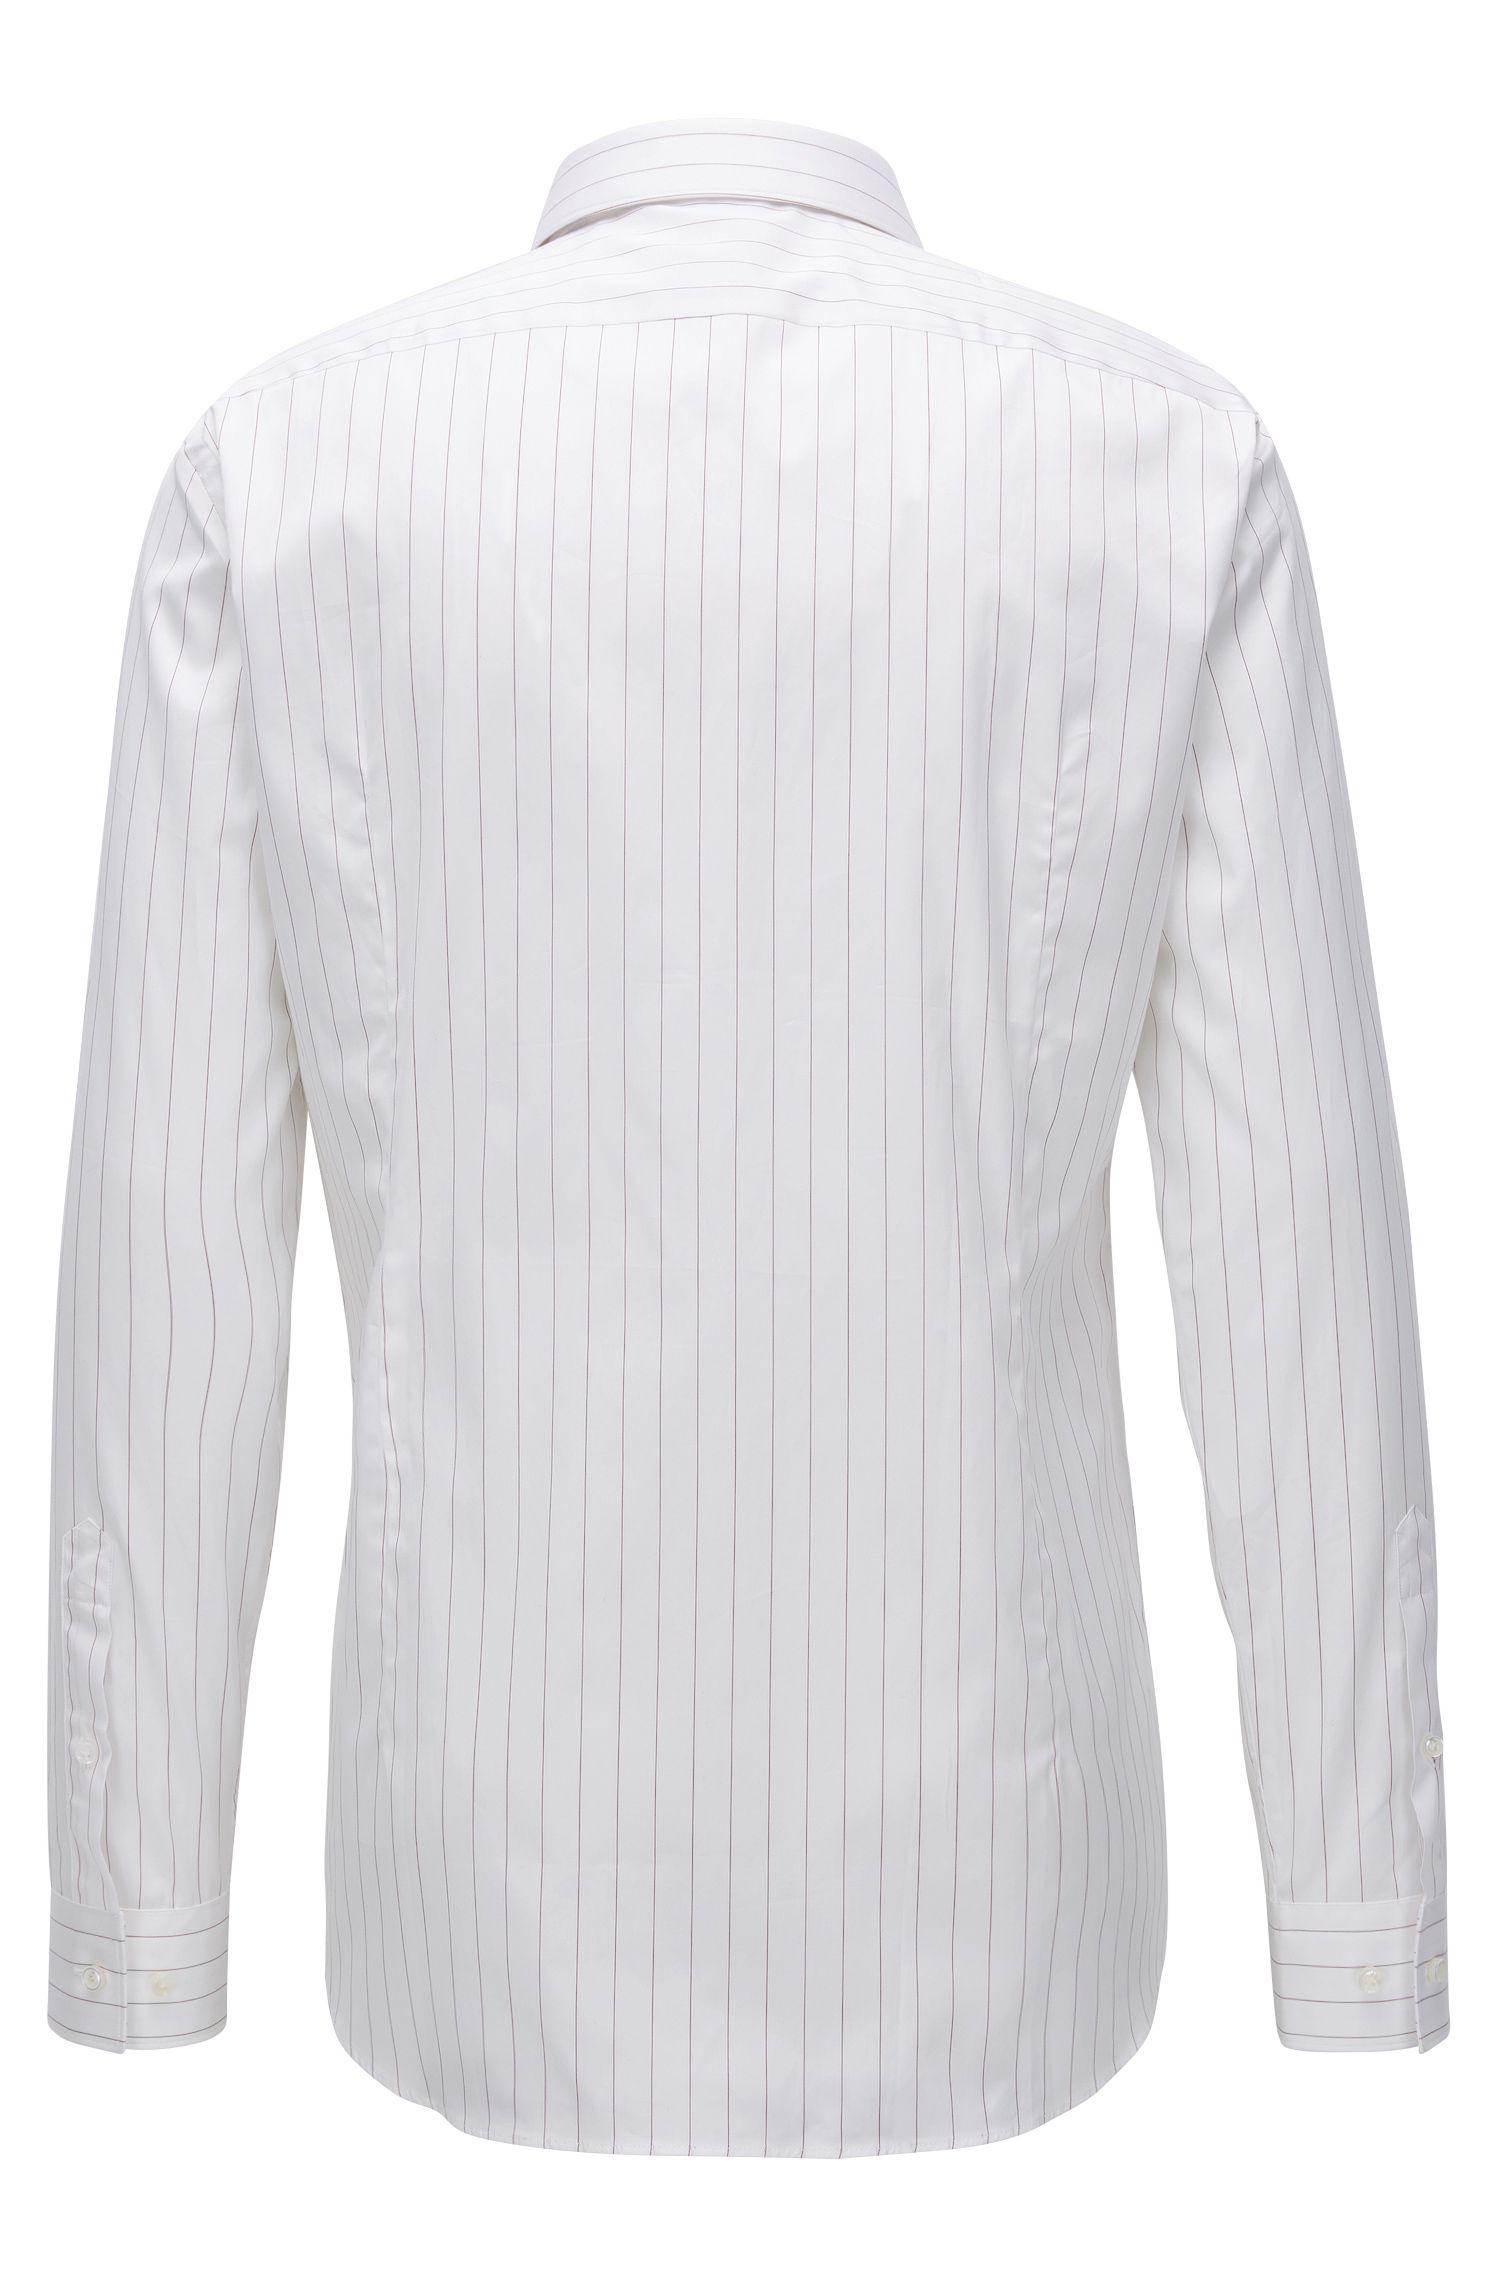 Striped Dress Shirt, Slim Fit | T-Charlie